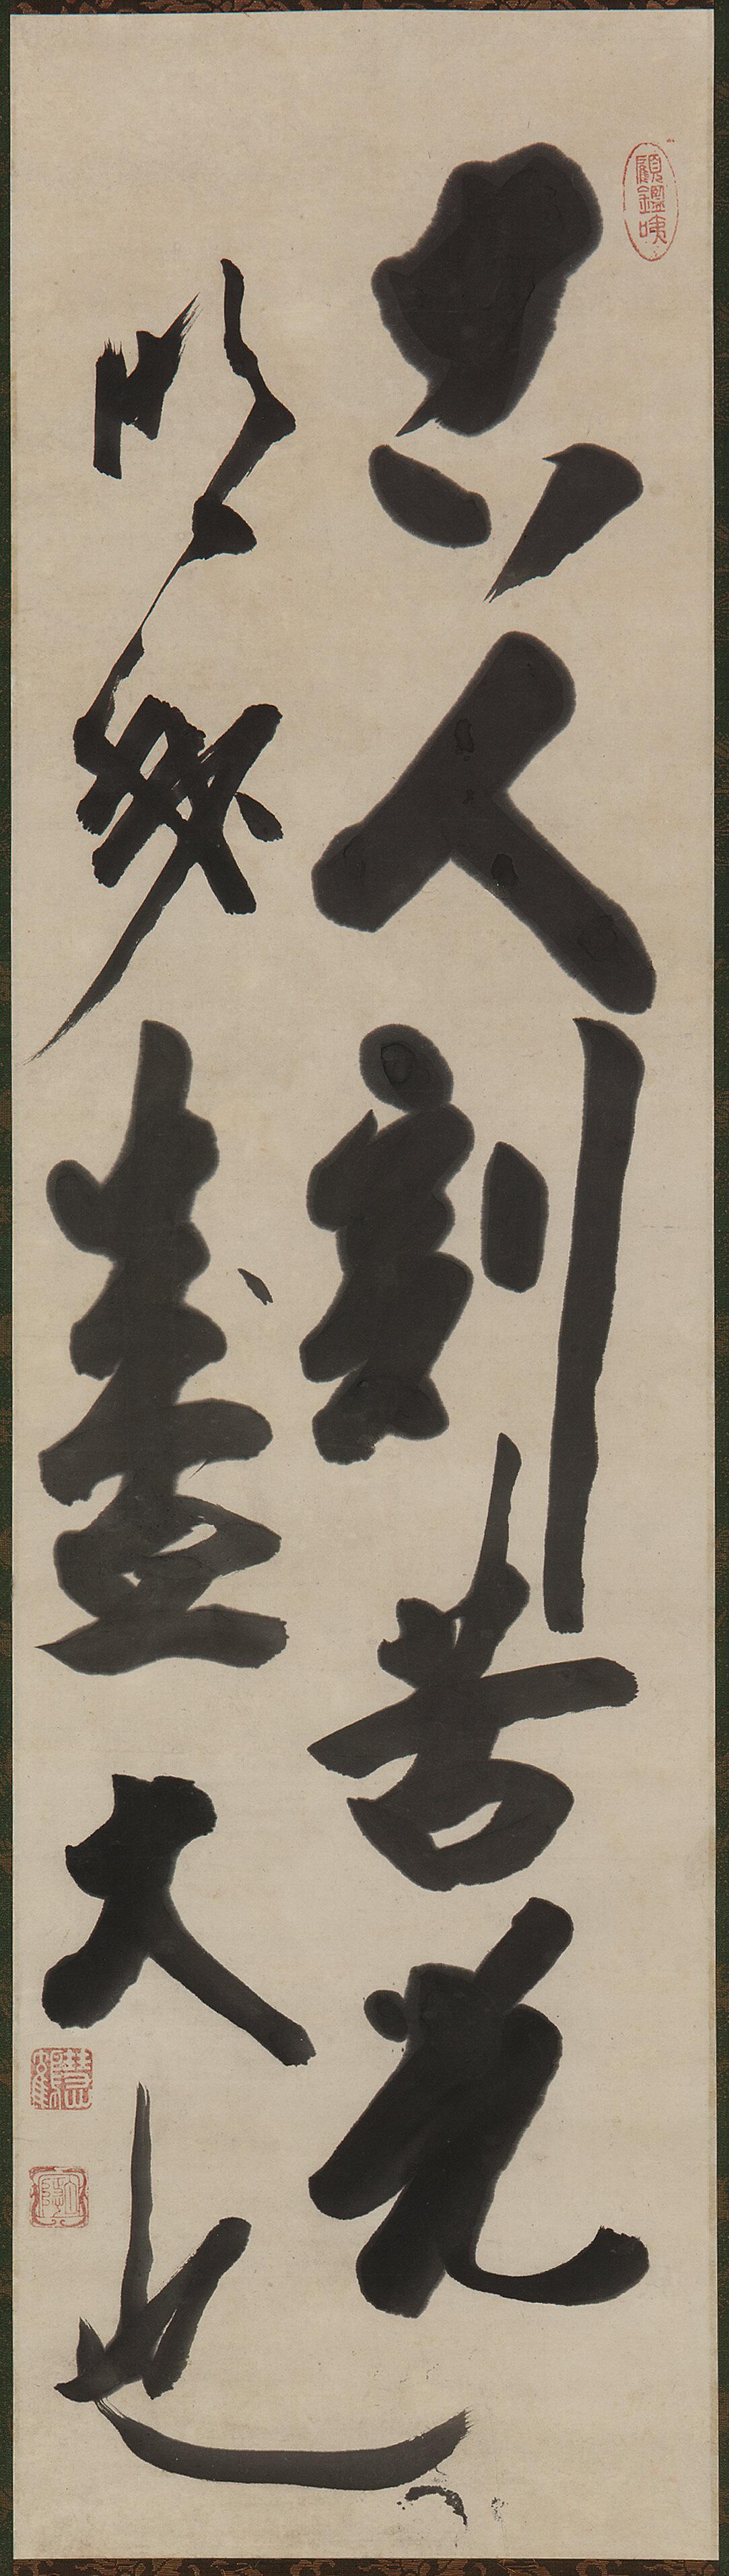 Performing mind writing meditation dgens fukanzazengi as zen 8 this zen aphorism by hakuin ekaku 16851768 exemplifies the bold and buycottarizona